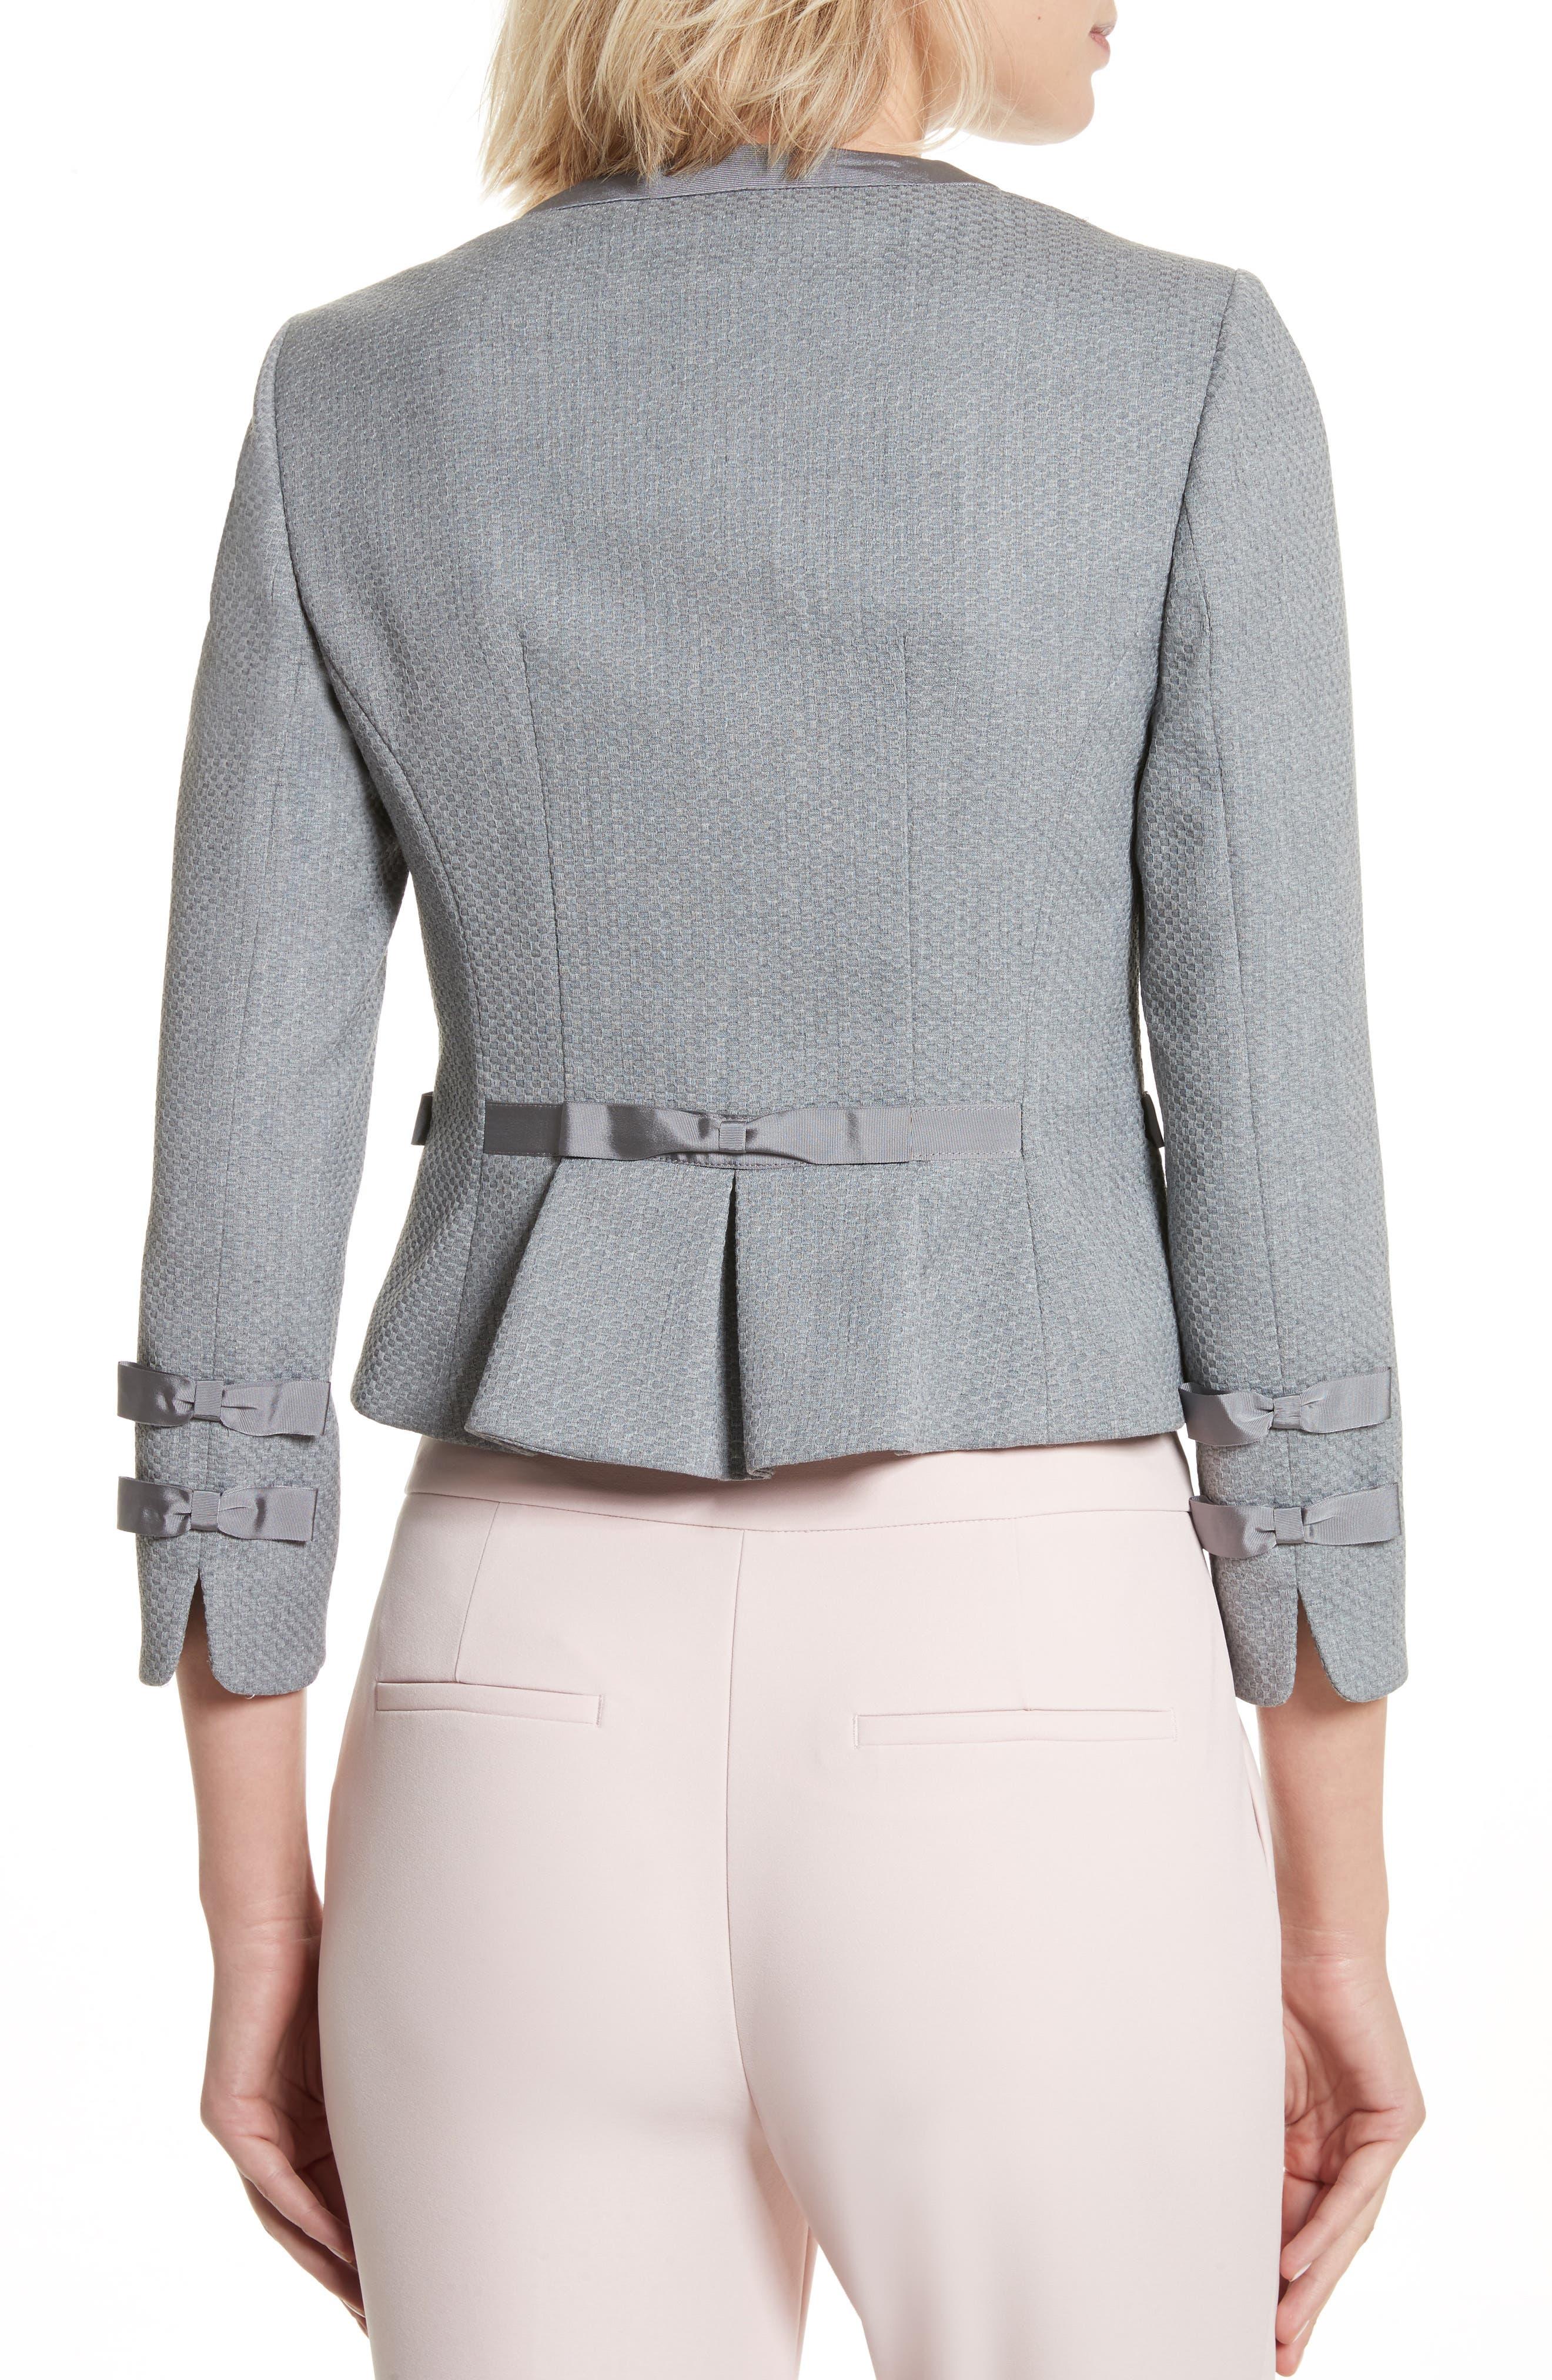 Nadae Bow Detail Crop Jacket,                             Alternate thumbnail 2, color,                             Mid Grey